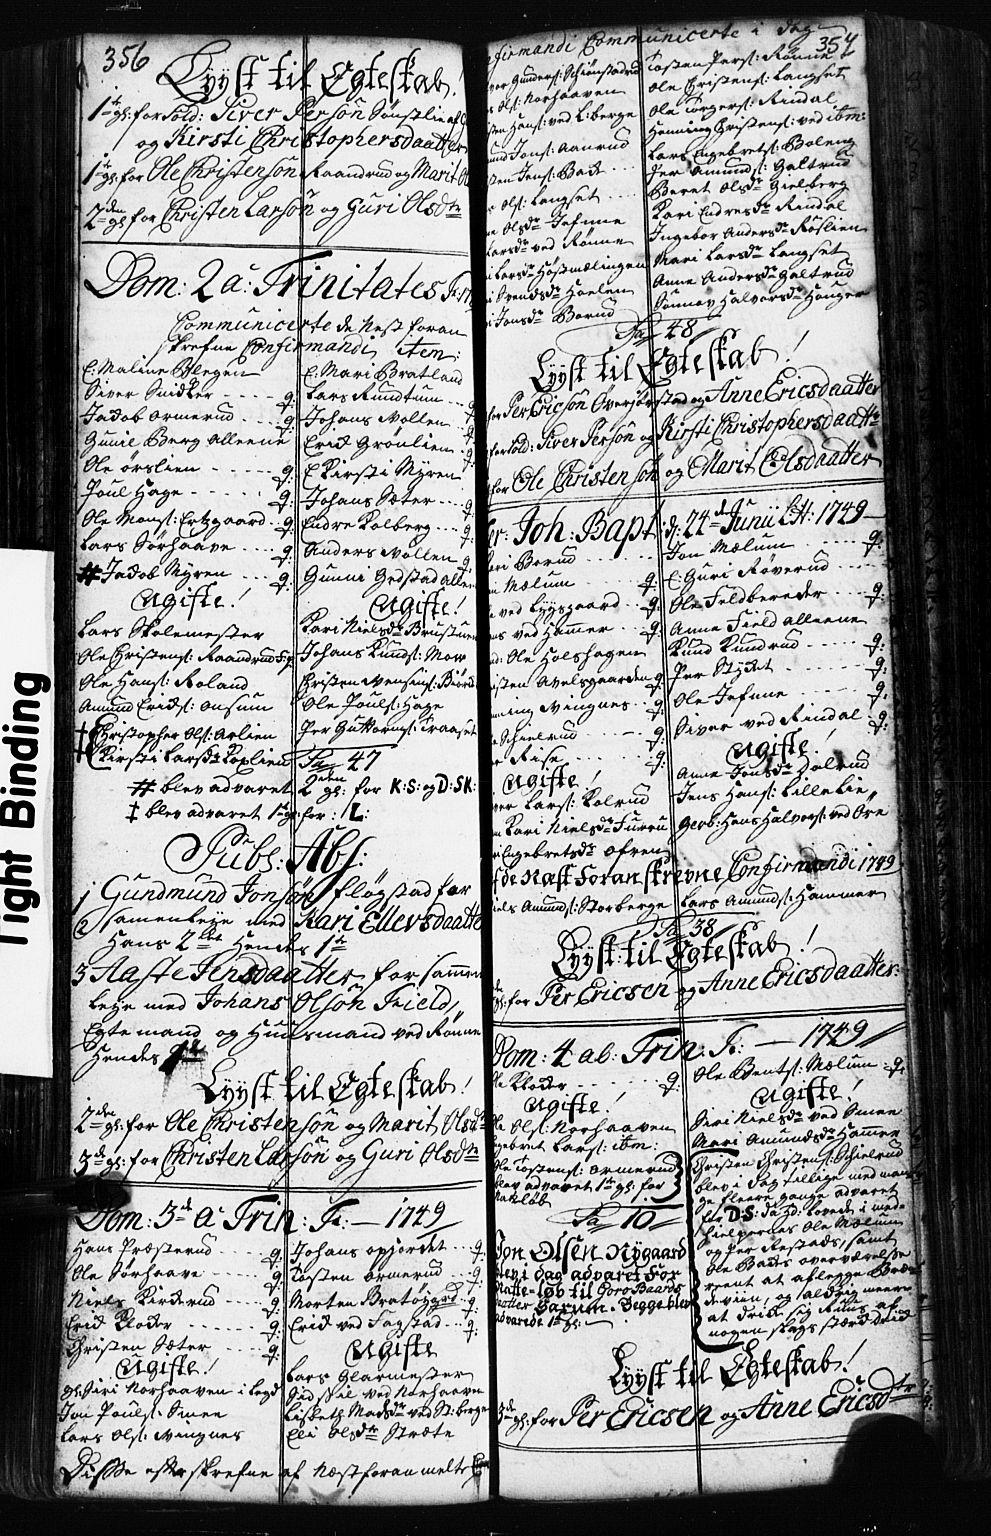 SAH, Fåberg prestekontor, Klokkerbok nr. 2, 1741-1756, s. 356-357